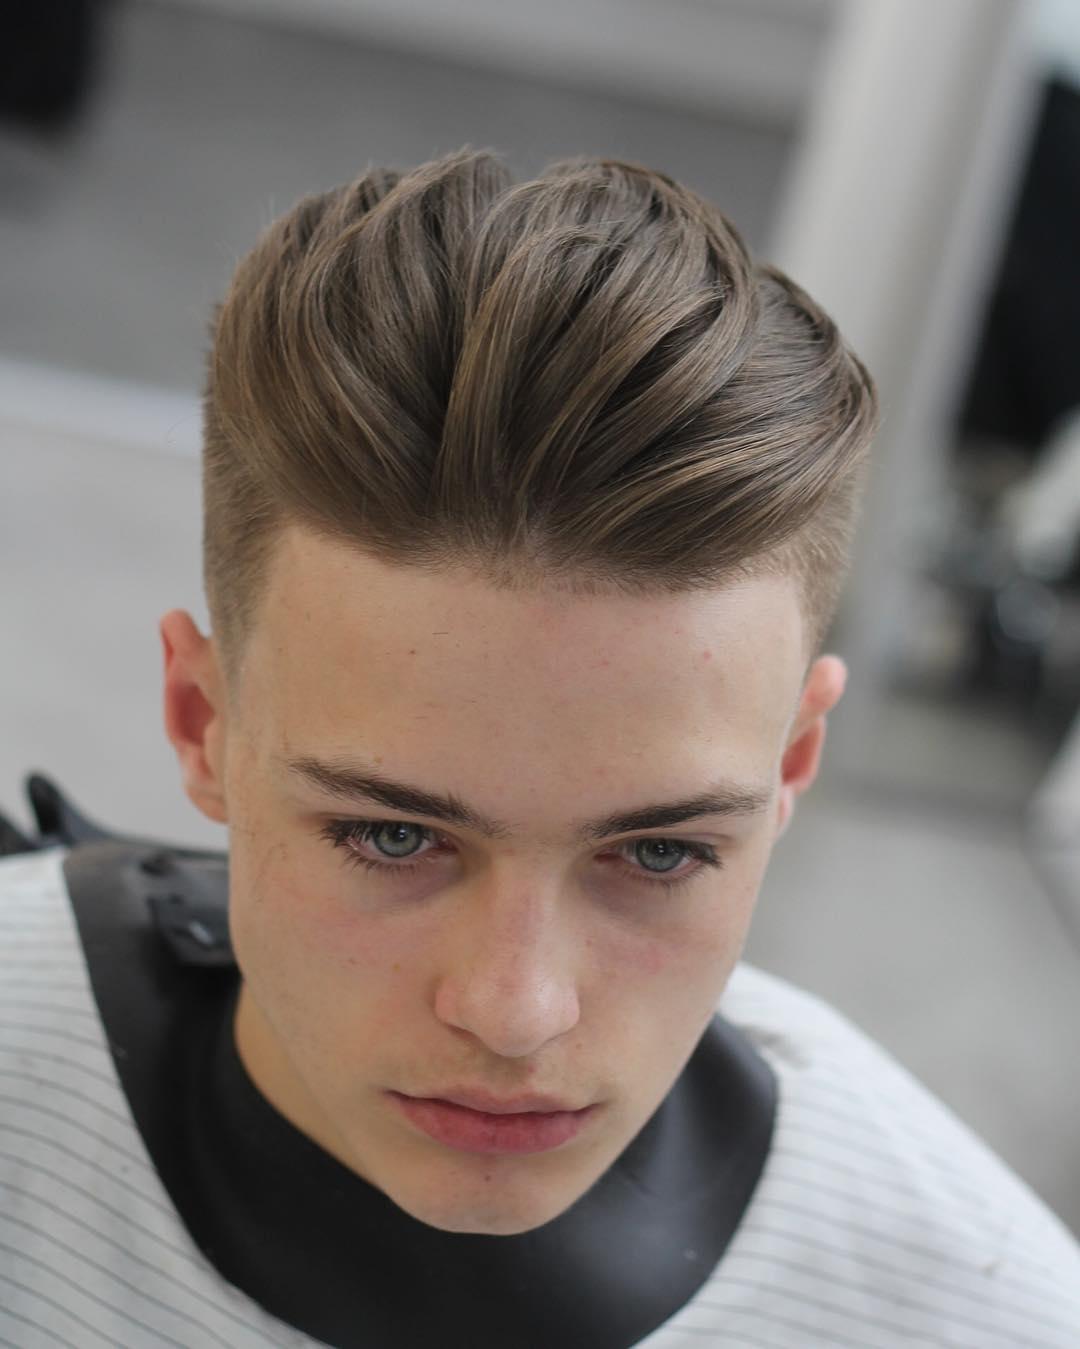 100 New Mens Hairstyles Top Picks